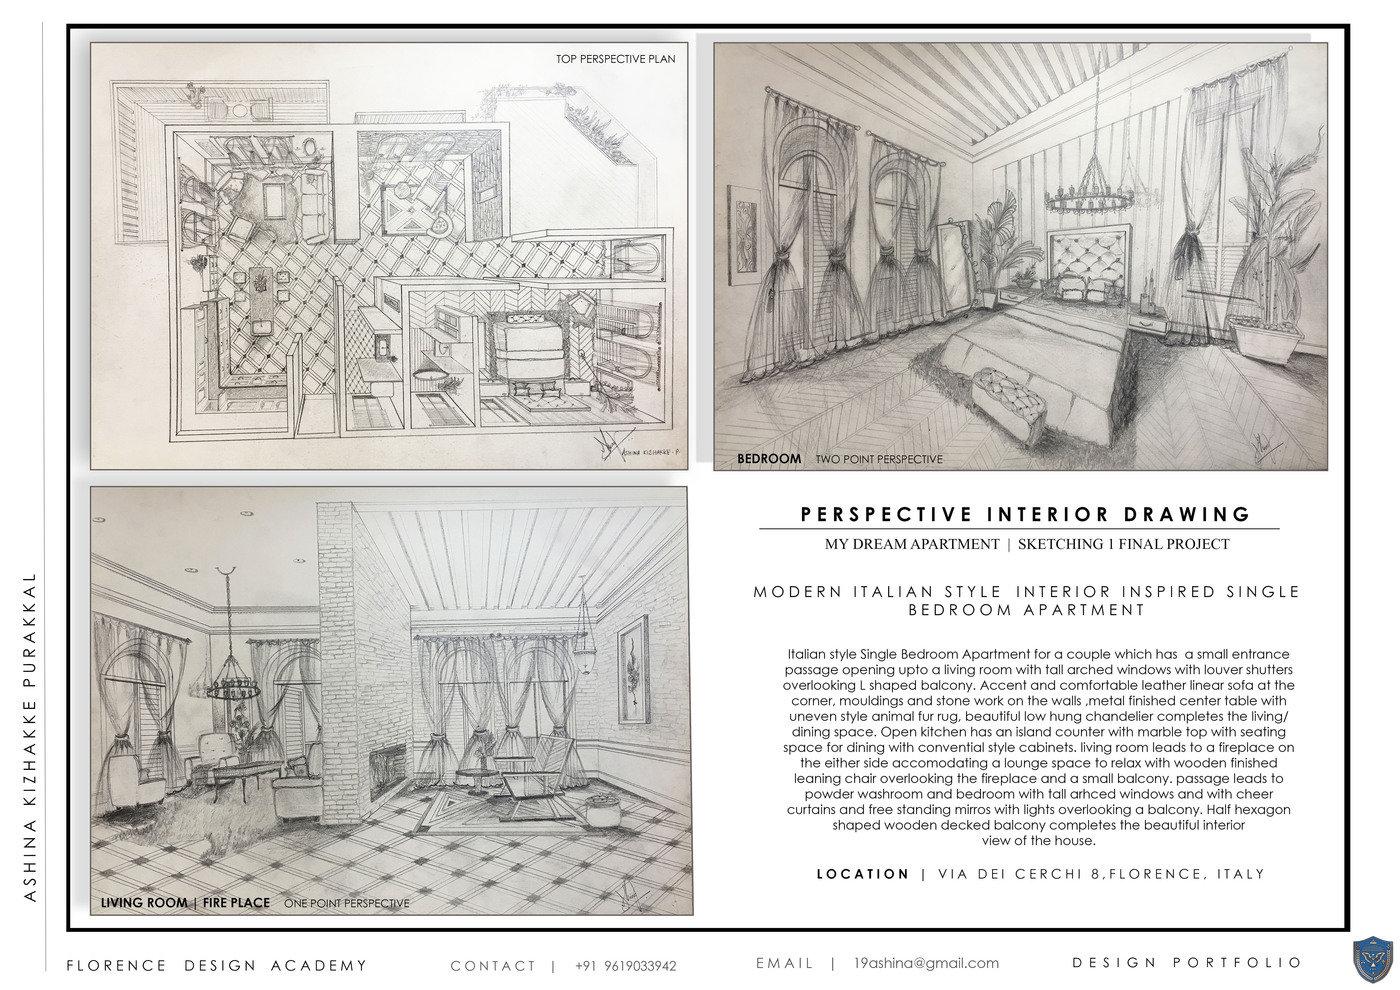 Italian Style House Perspective Drawings By Ashina K P At Coroflot Com